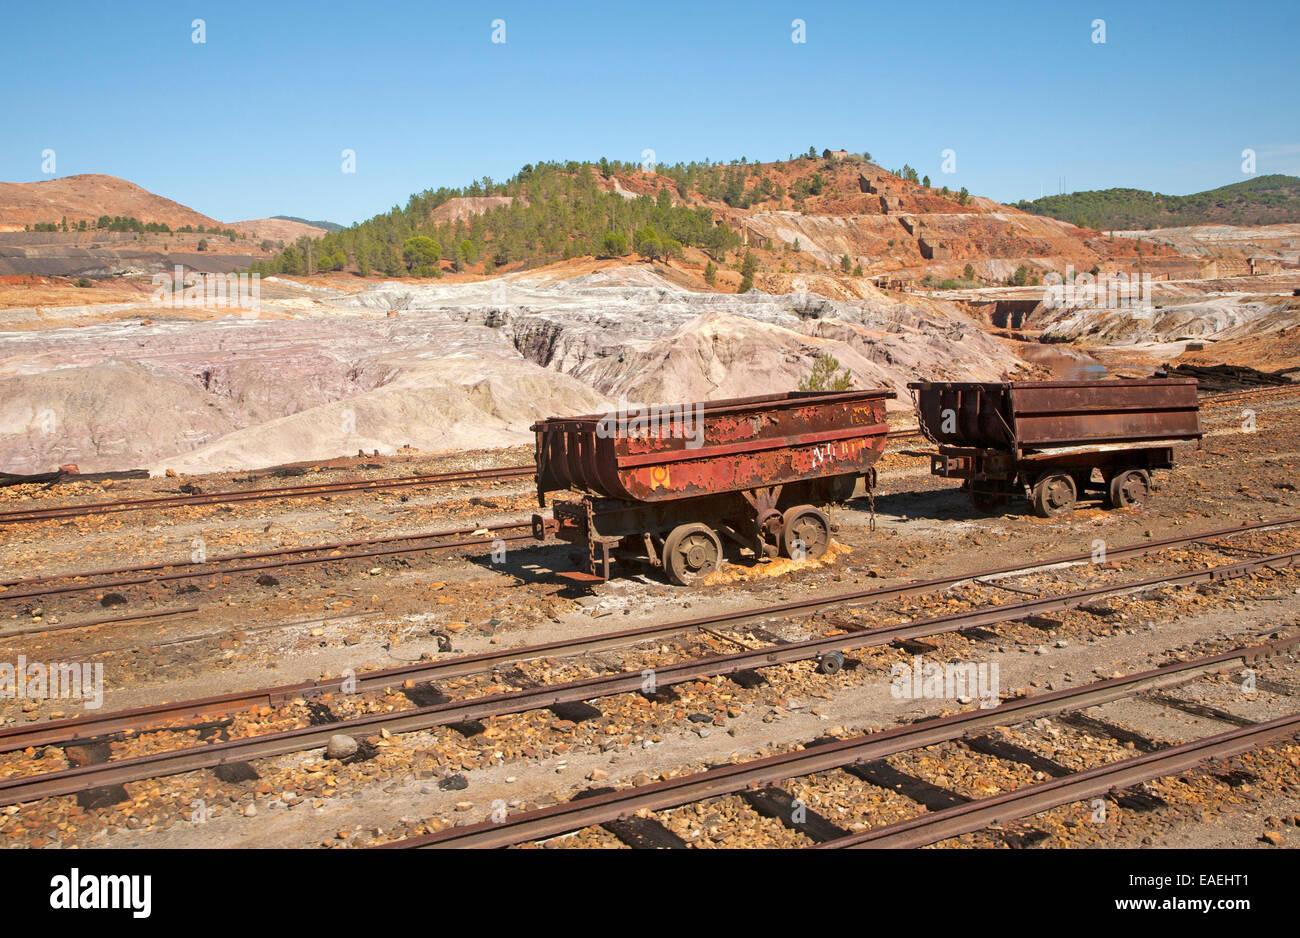 Old rusty abandoned railway rolling stock wagons in the Rio Tinto mining area, Minas de Riotinto, Huelva province, - Stock Image